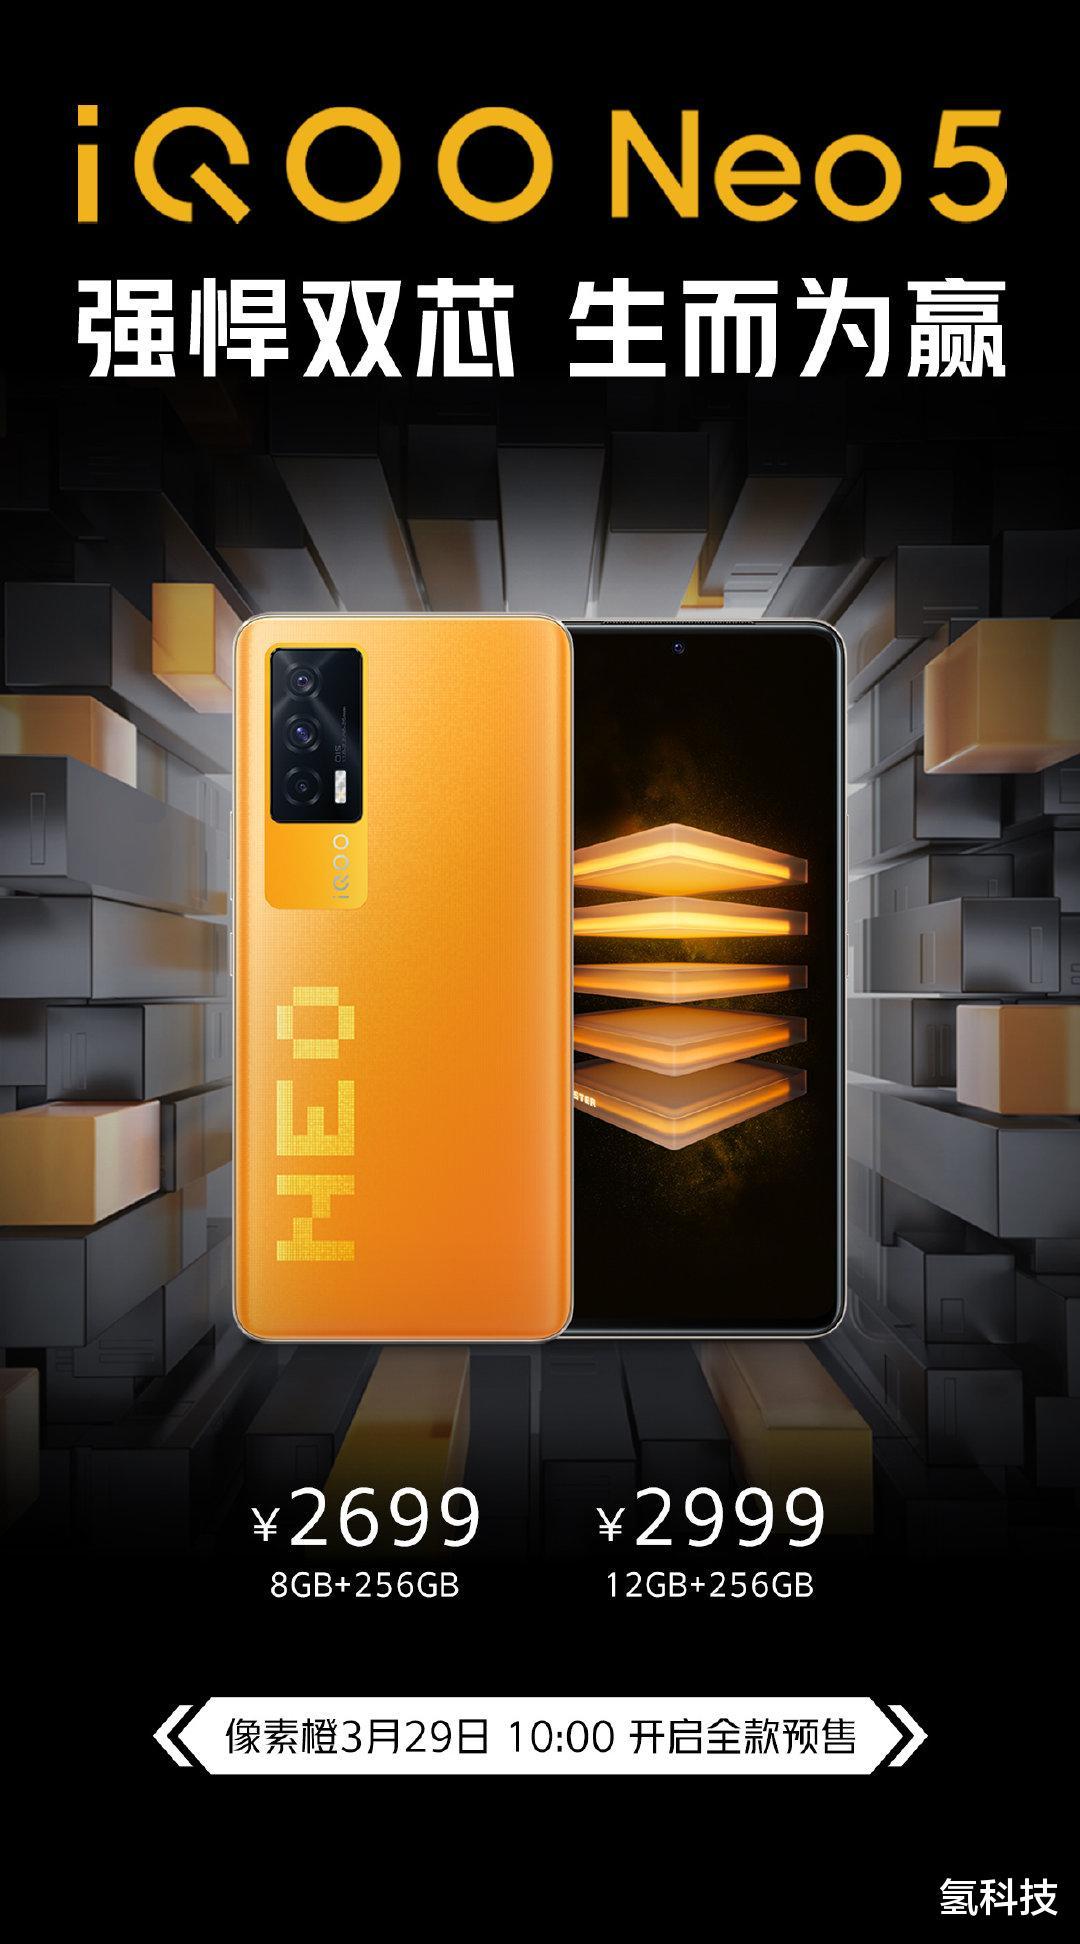 iQOO Neo5像素橙开启预售,抢到就是赚到!